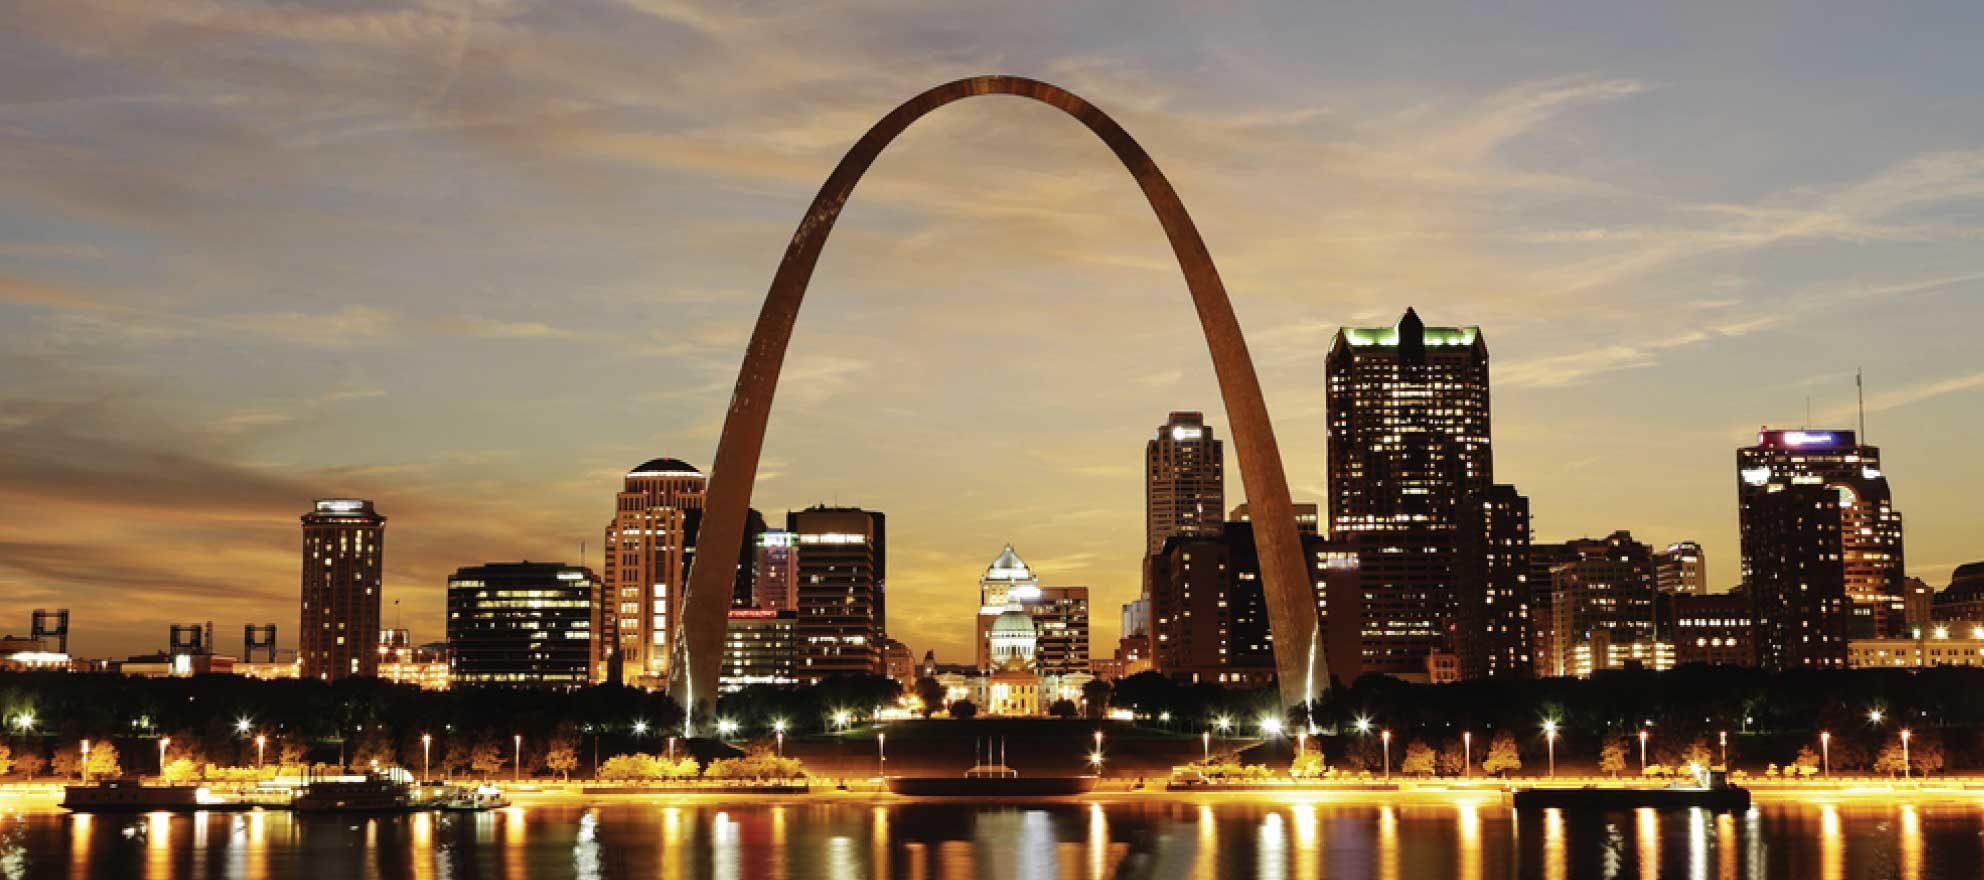 Redfin glides into tech-friendly St. Louis